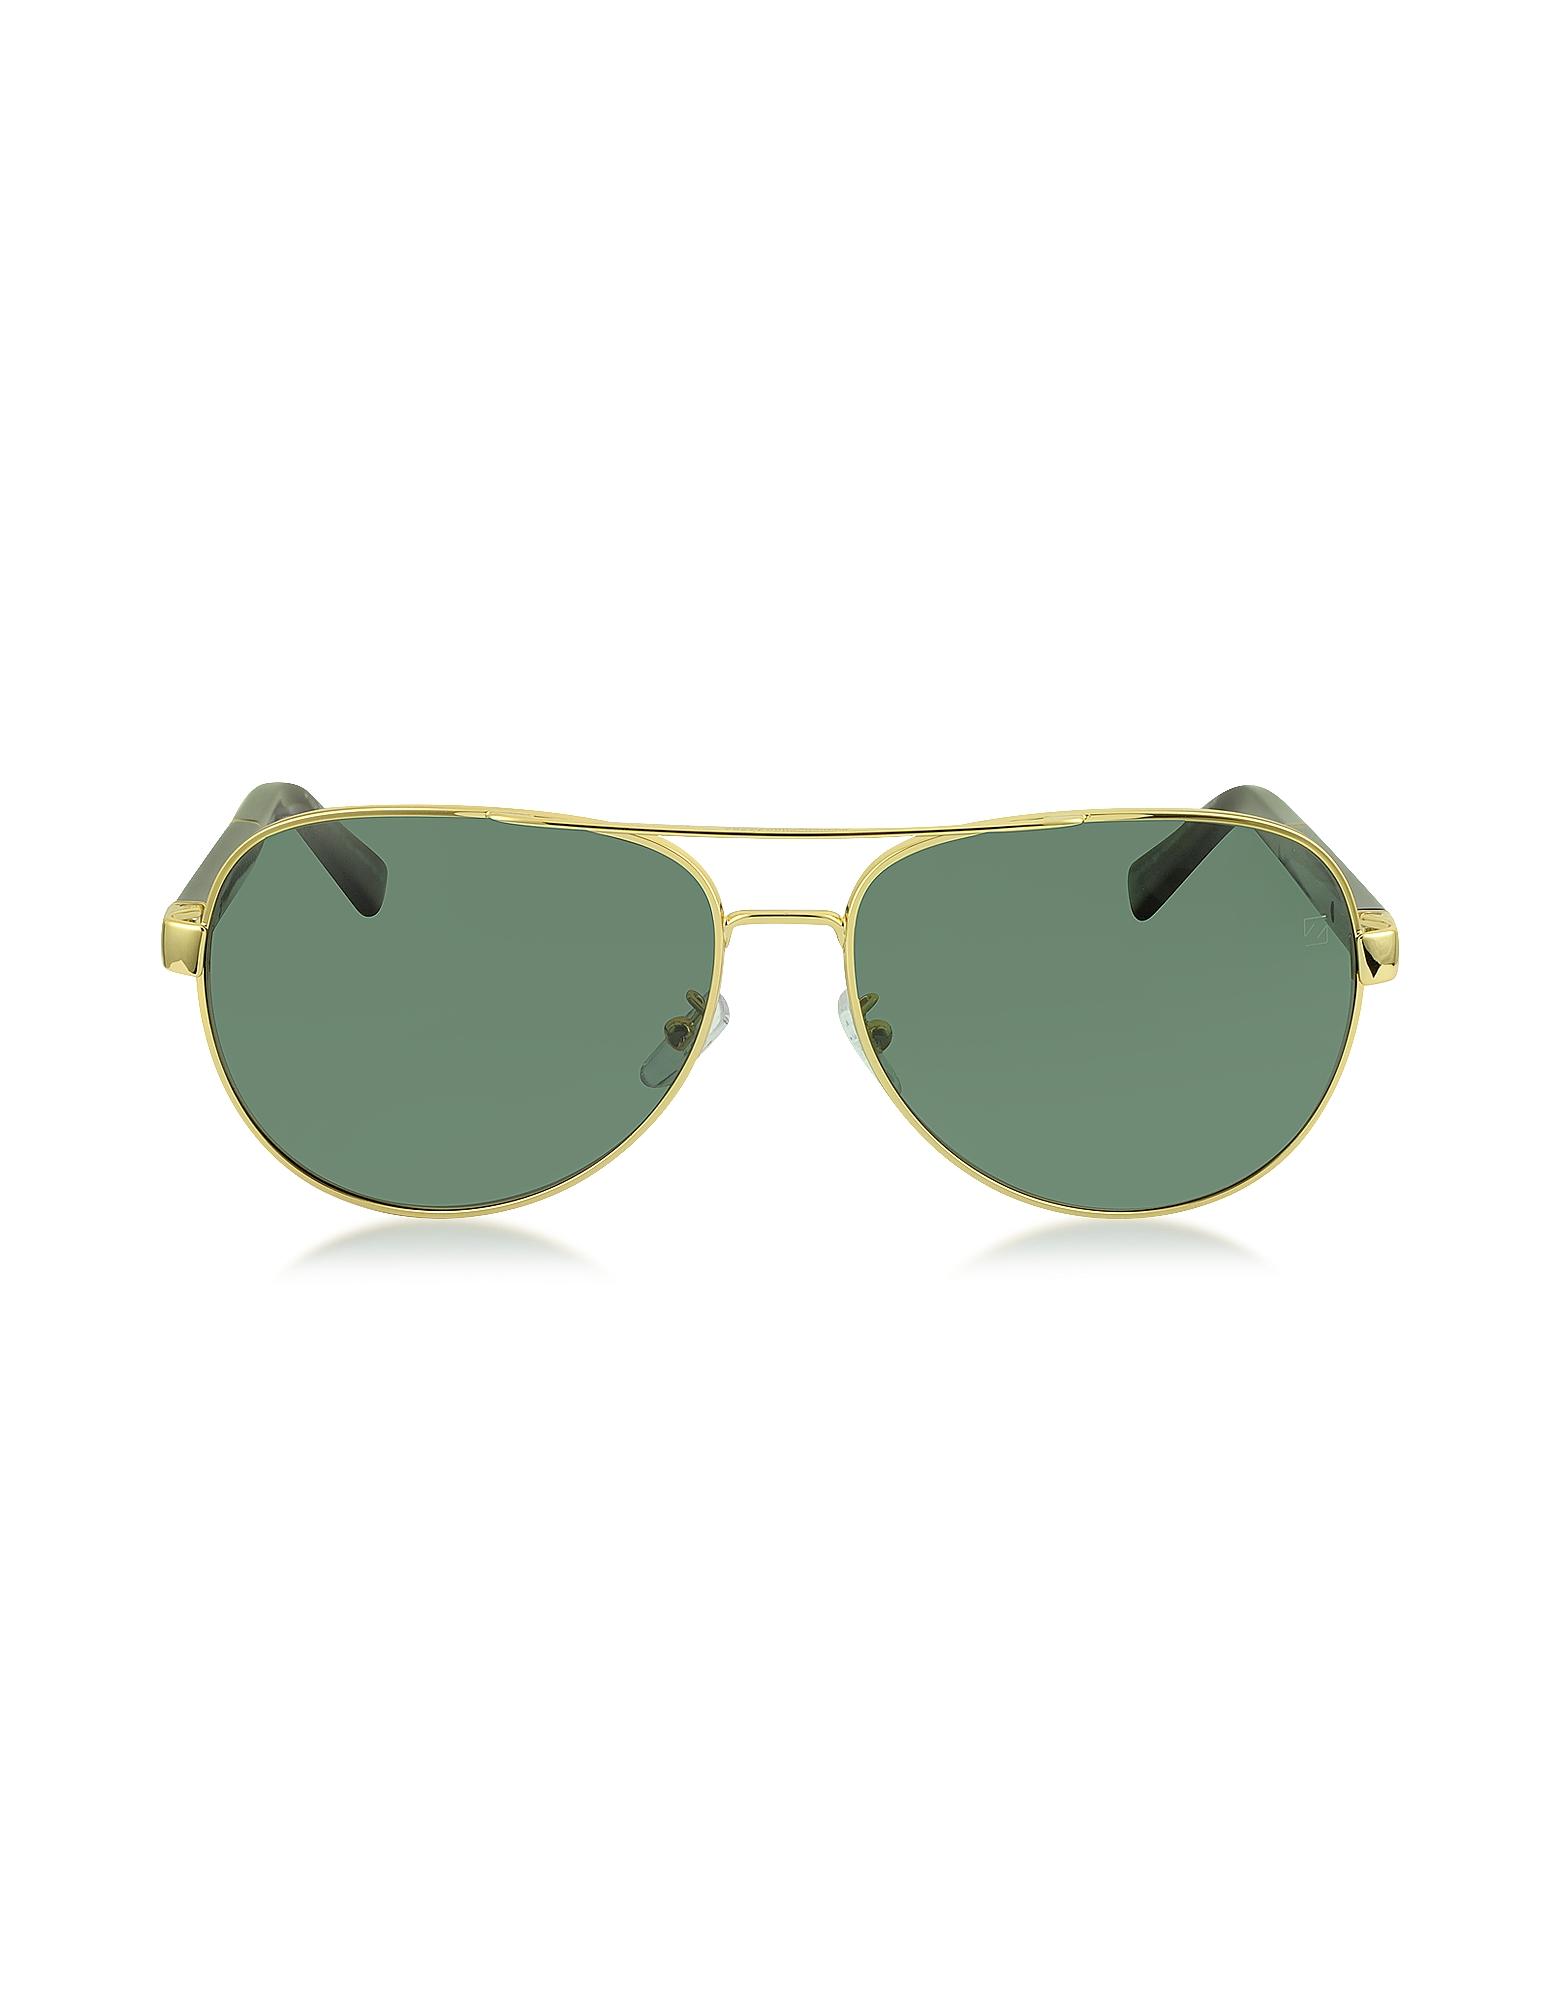 Ermenegildo Zegna Sunglasses, EZ0010 30R Gold Metal & Brown Acetate Aviator Men's Sunglasses